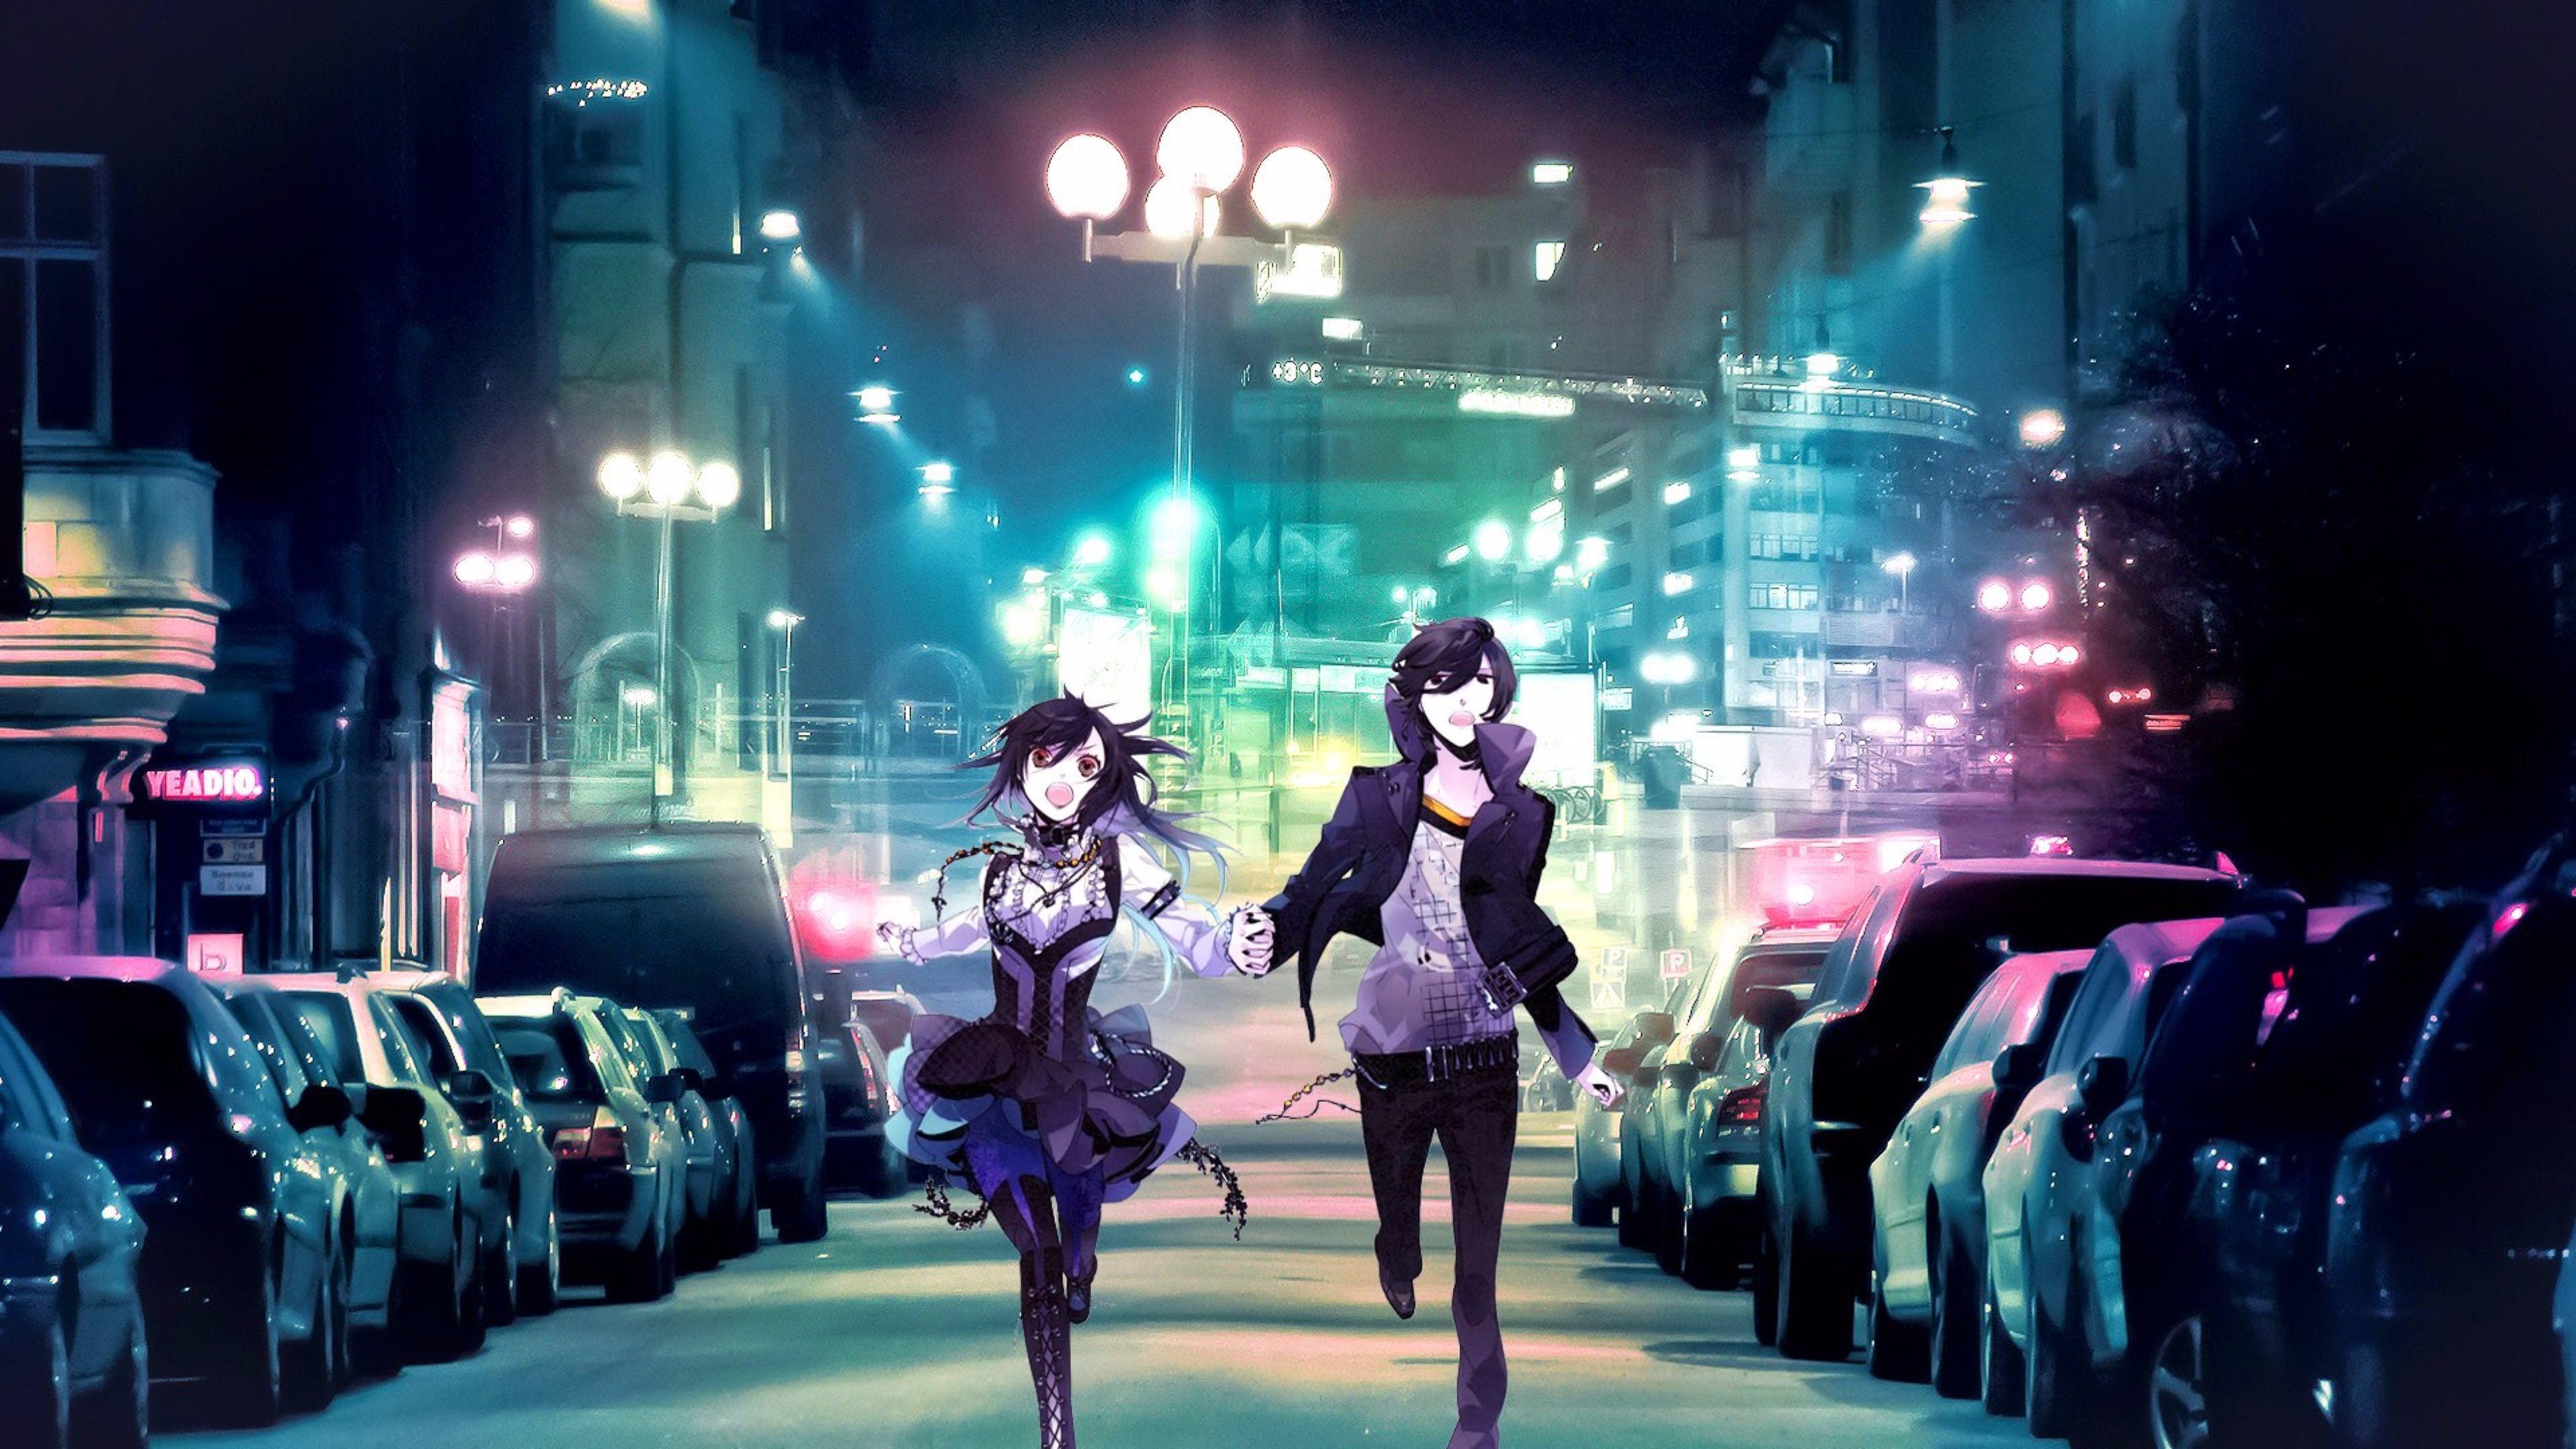 Ảnh nền 4K anime